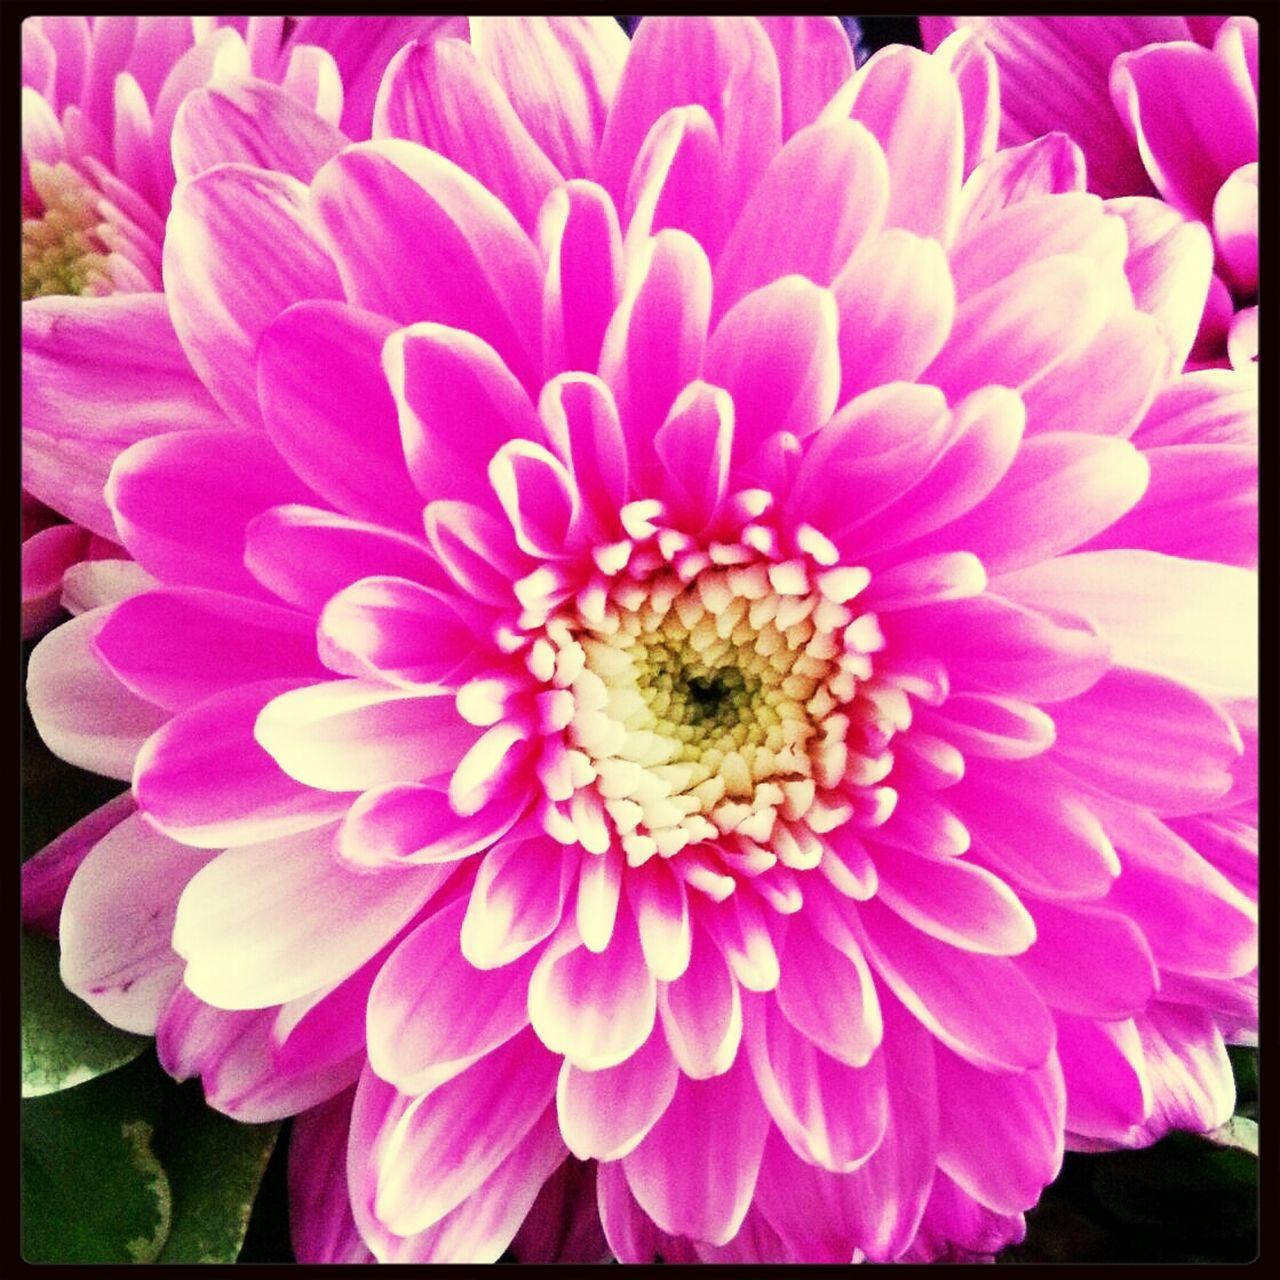 Close-Up Of Pink Dahlia Flower